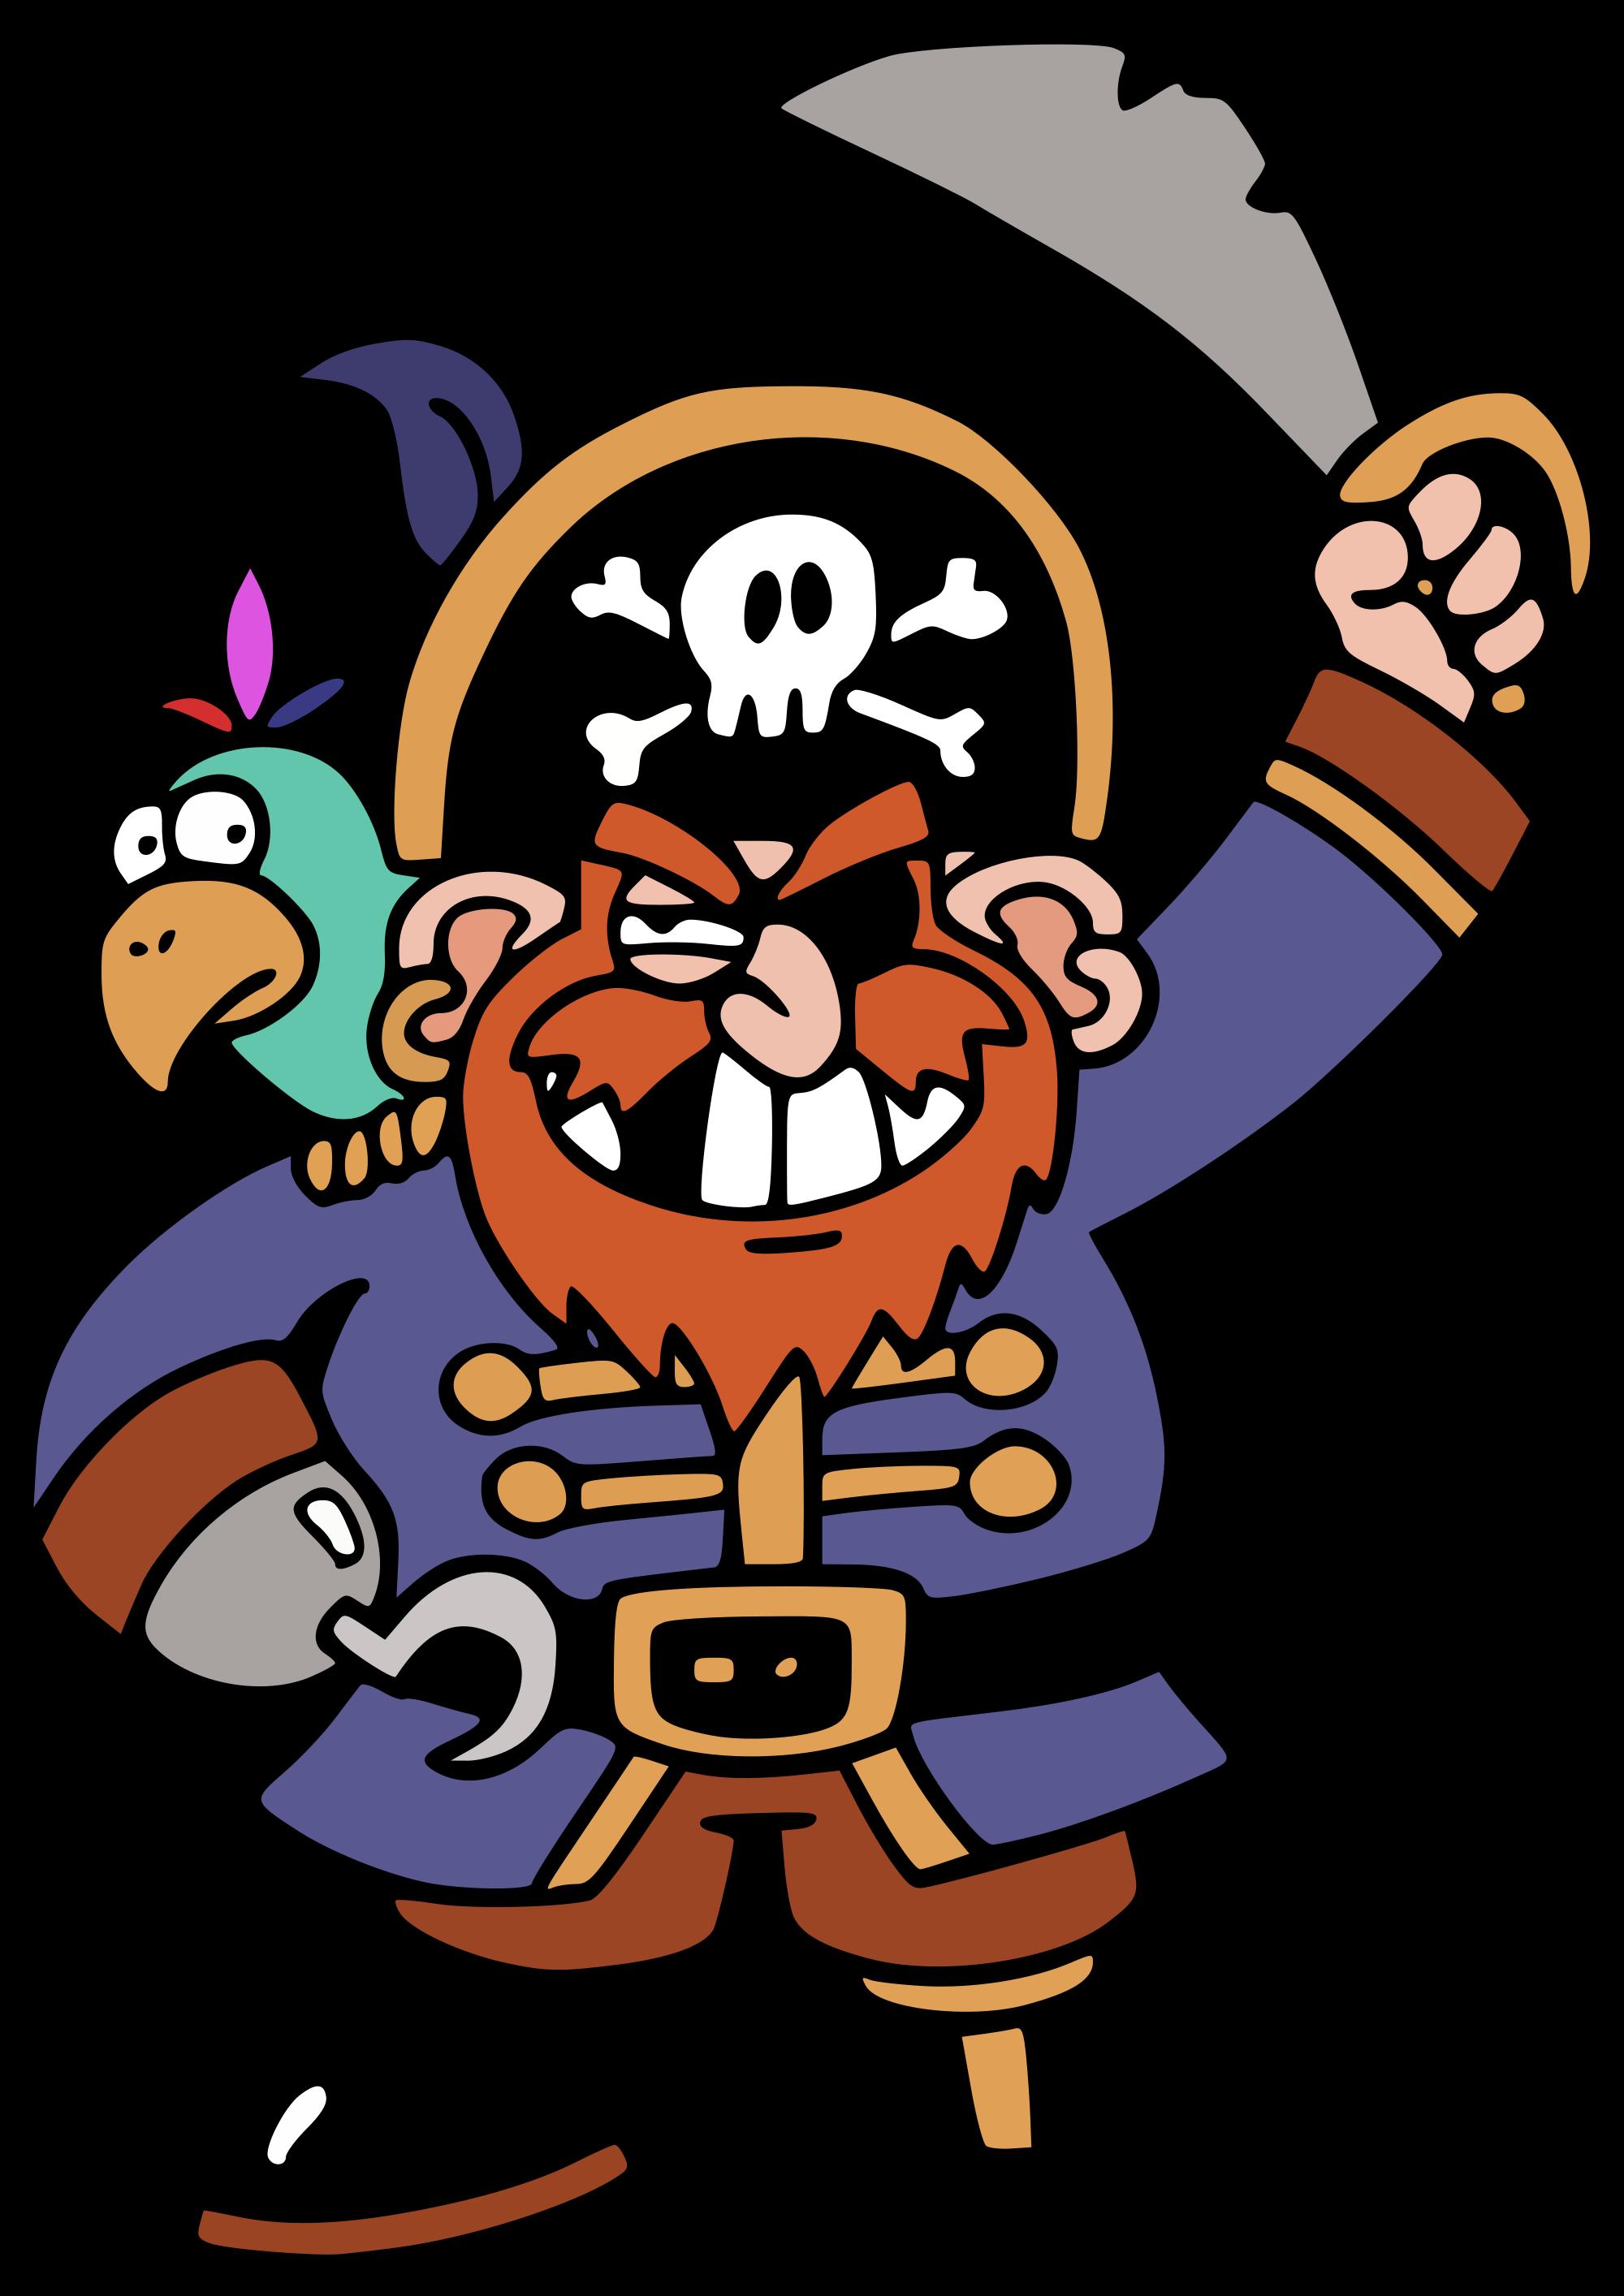 Pirate money clipart image freeuse stock Talk Like a Pirate Day image freeuse stock